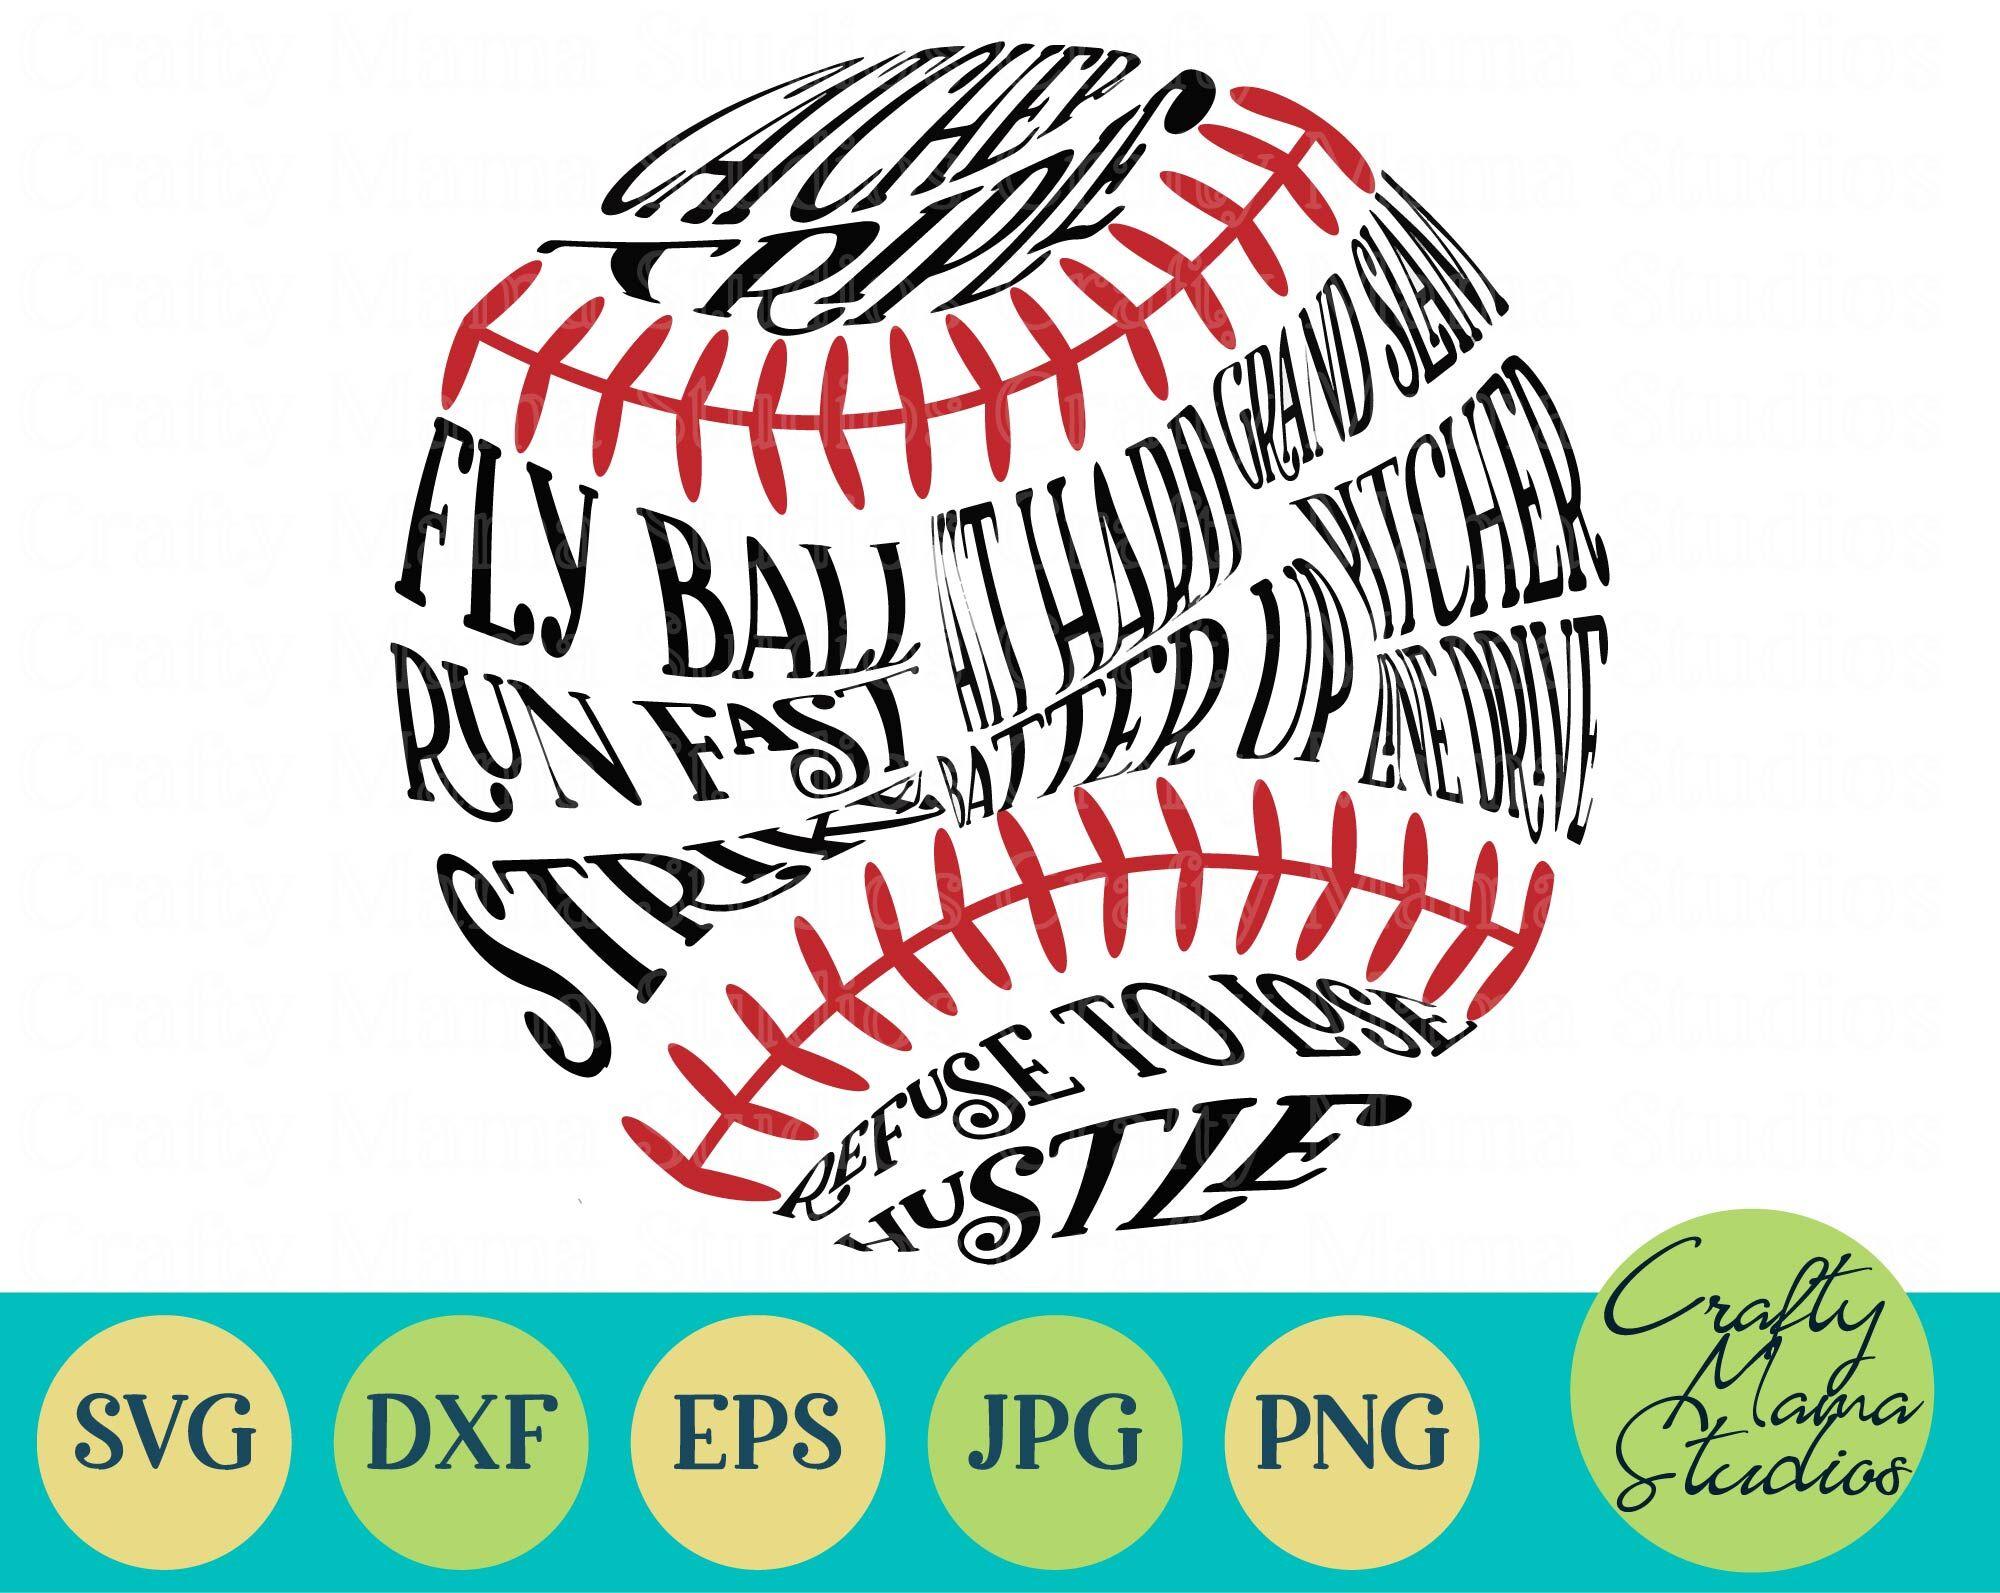 Baseball Words Svg Baseball Mom Svg Sports Svg By Crafty Mama Studios Thehungryjpeg Com